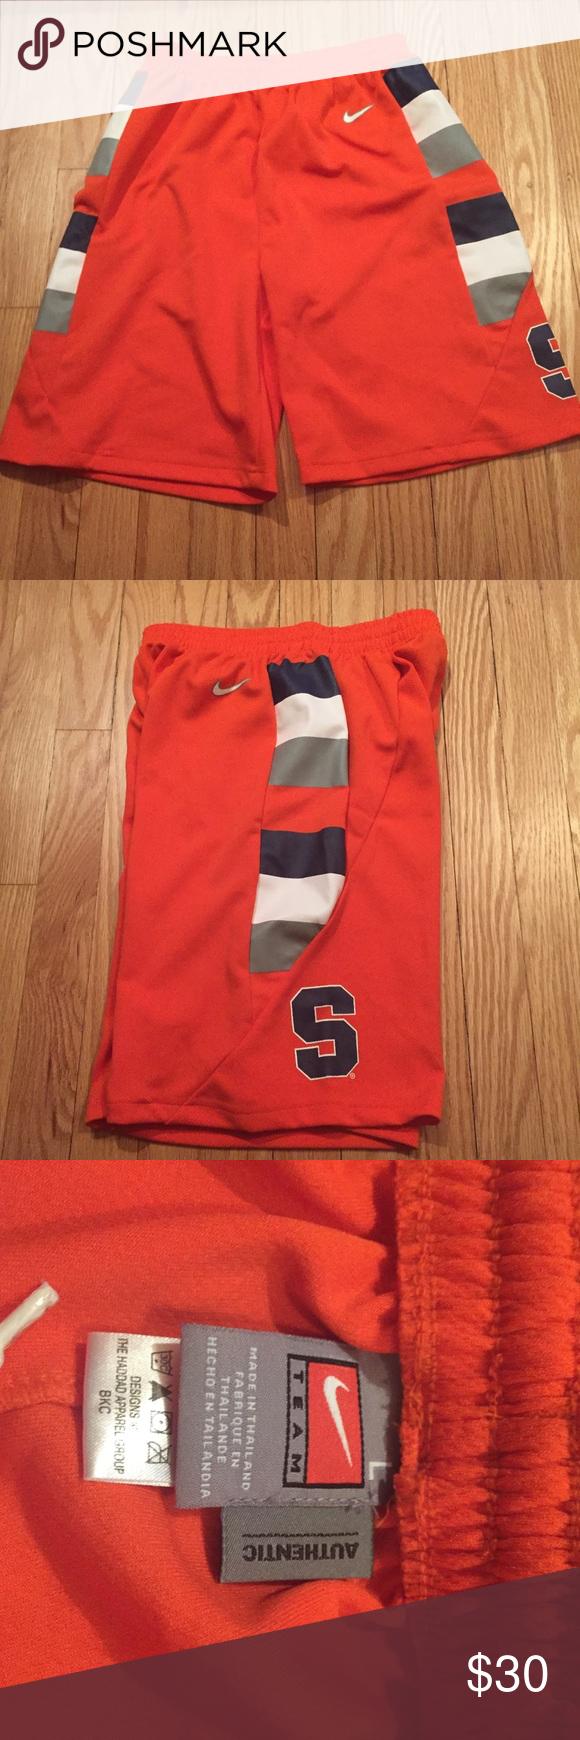 Syracuse Basketball Nike Apparel Rldm